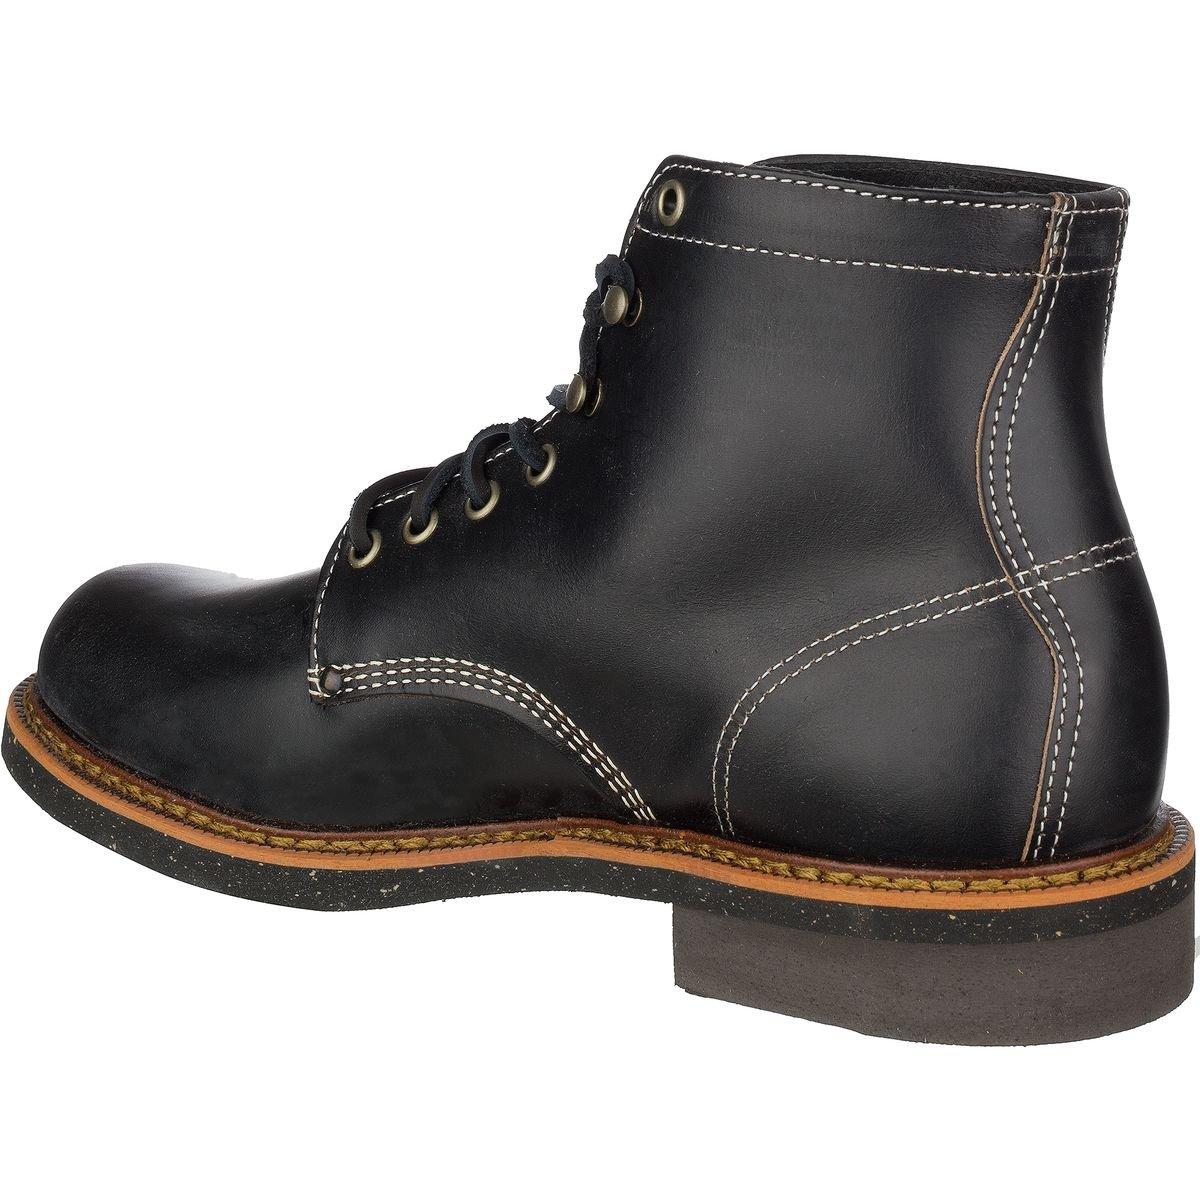 321edd99ad7 Thorogood 1892 Beloit Boot Black Leather Horween CXL 814-6532 ...